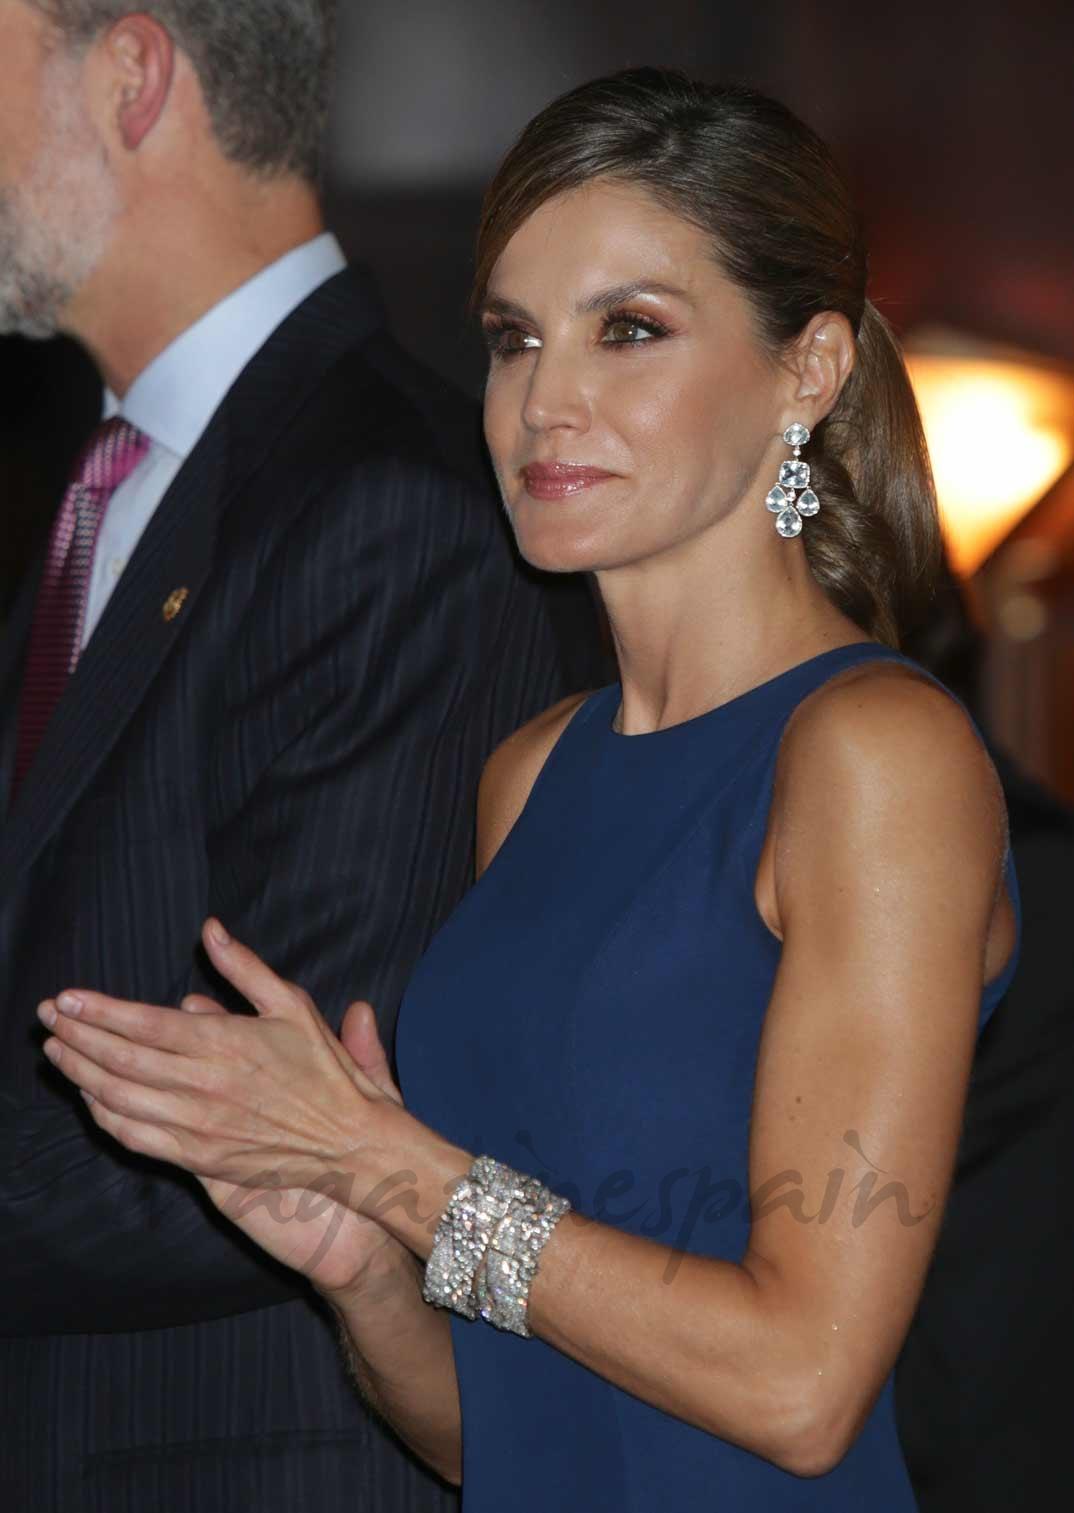 Reina Letizia concierto princesa de asturias